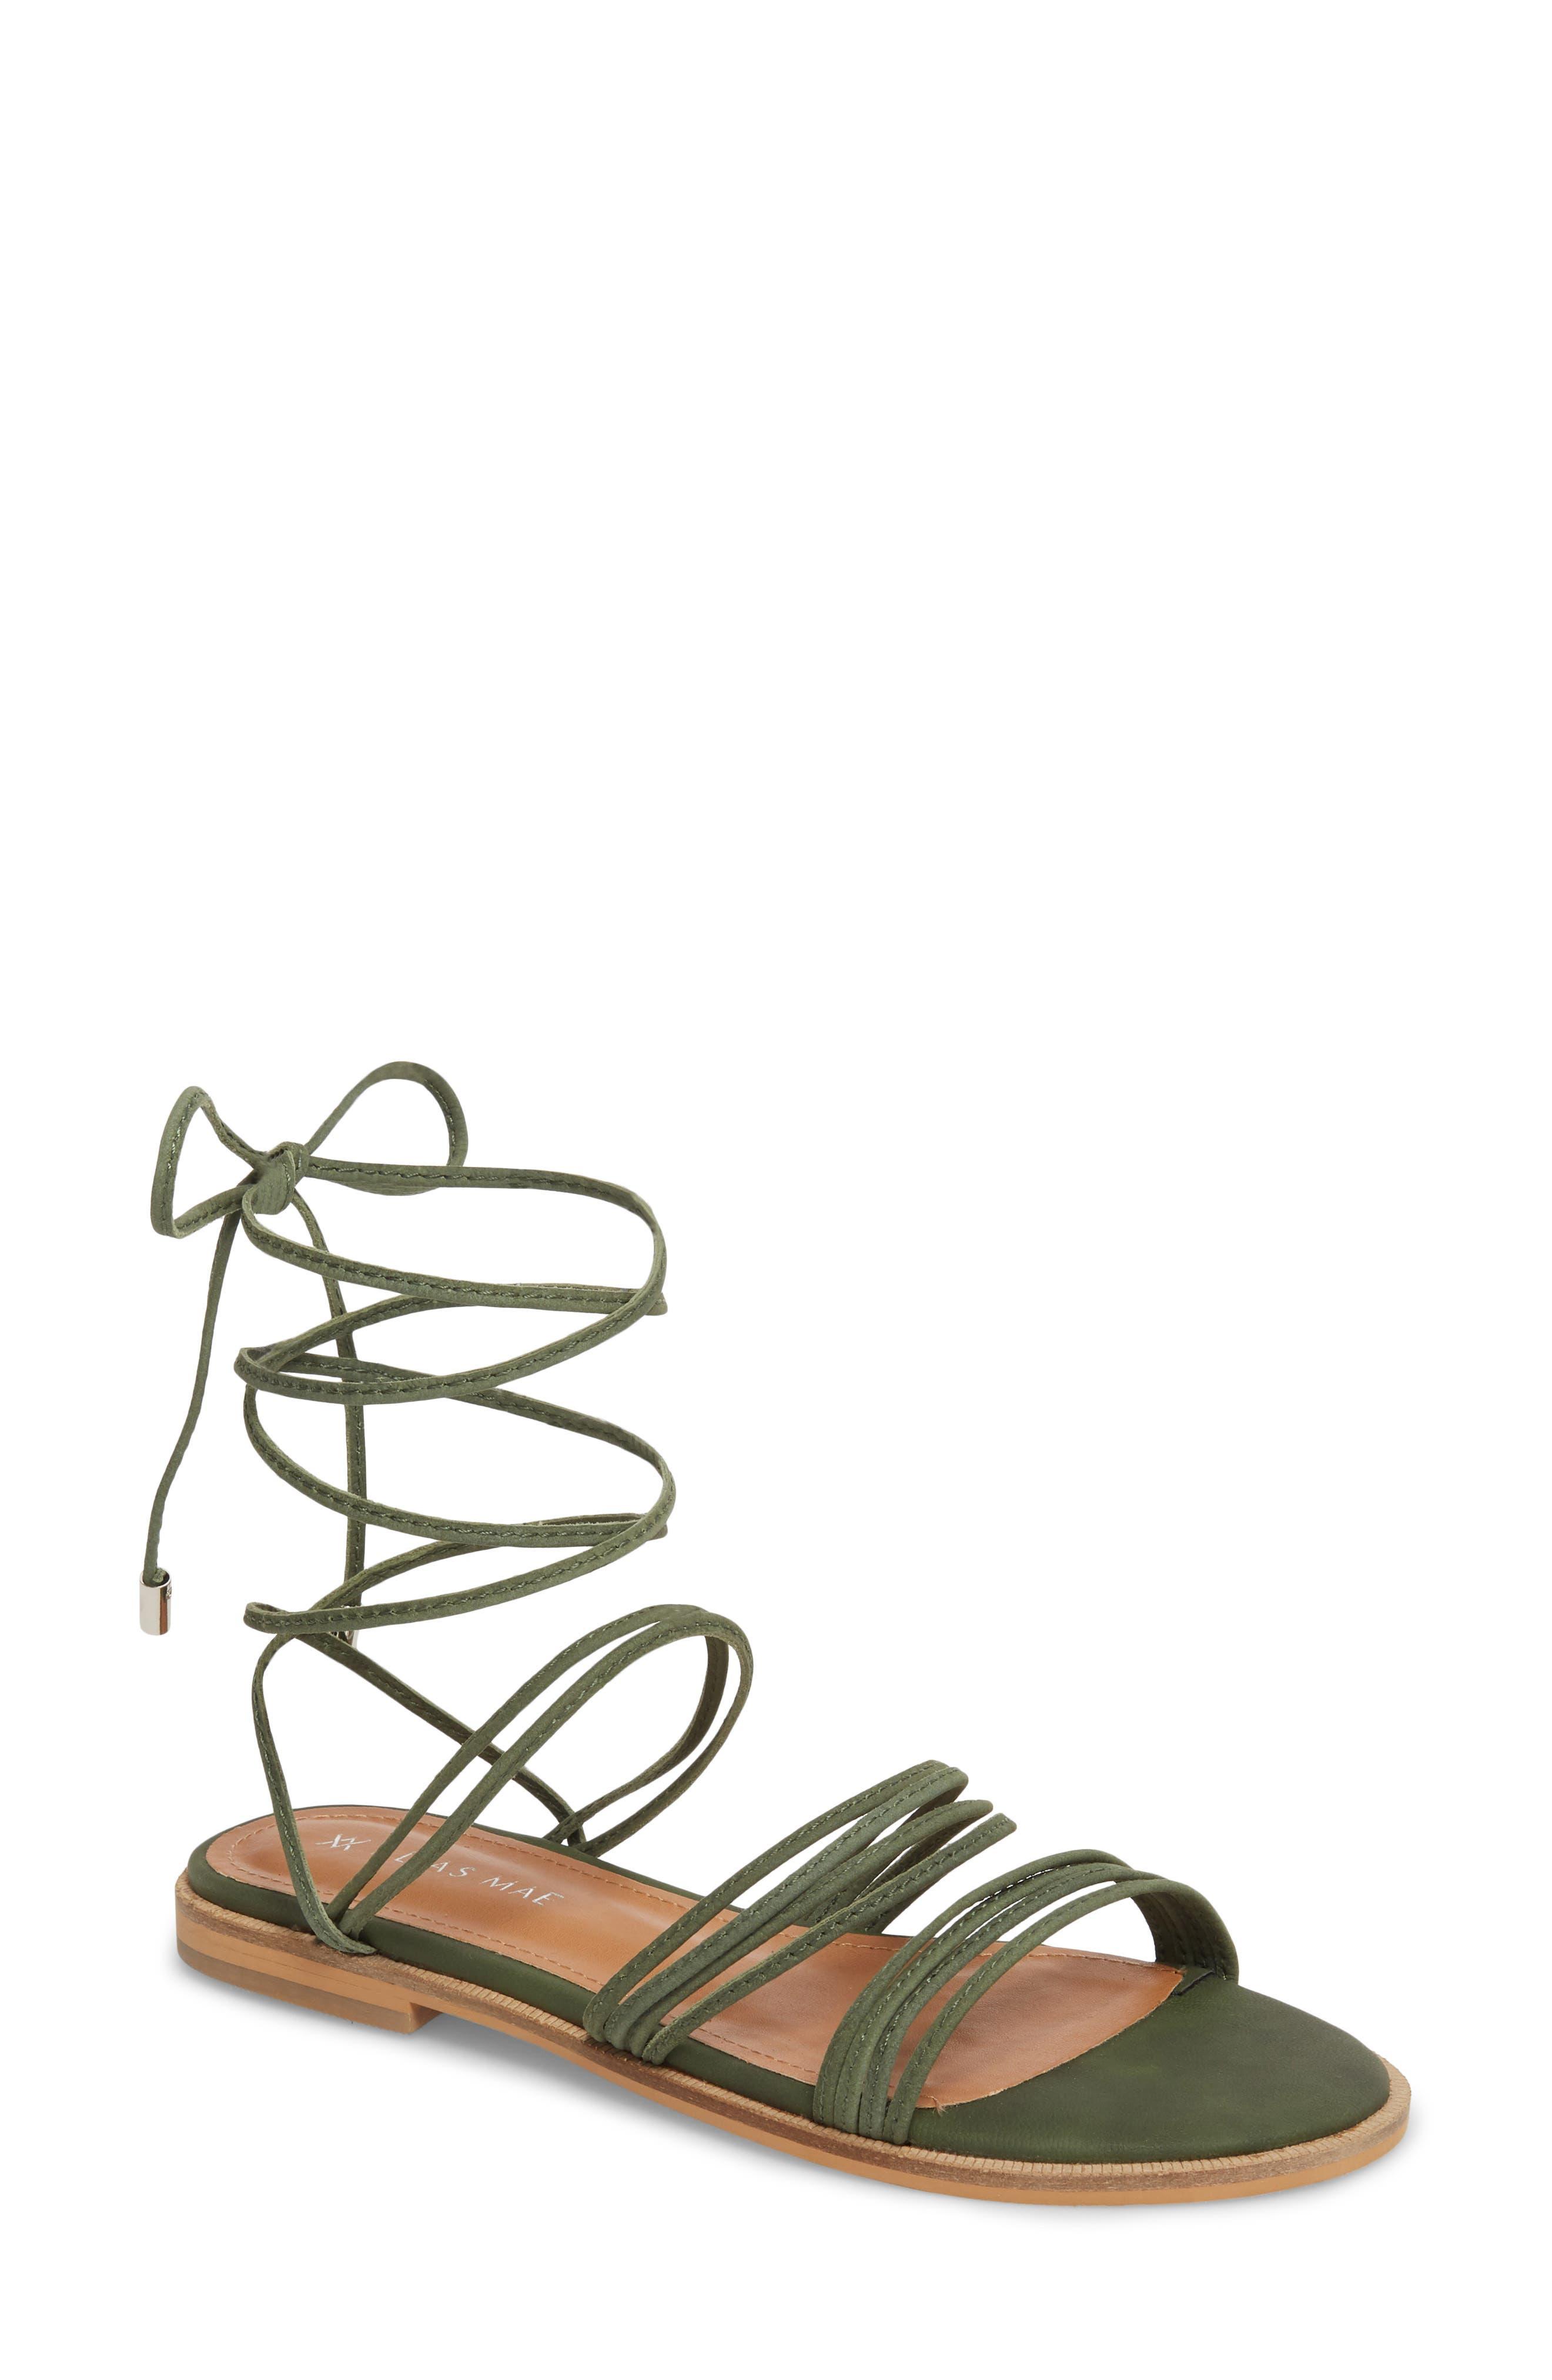 Theory Strappy Flat Sandal,                             Main thumbnail 1, color,                             Khaki Leather